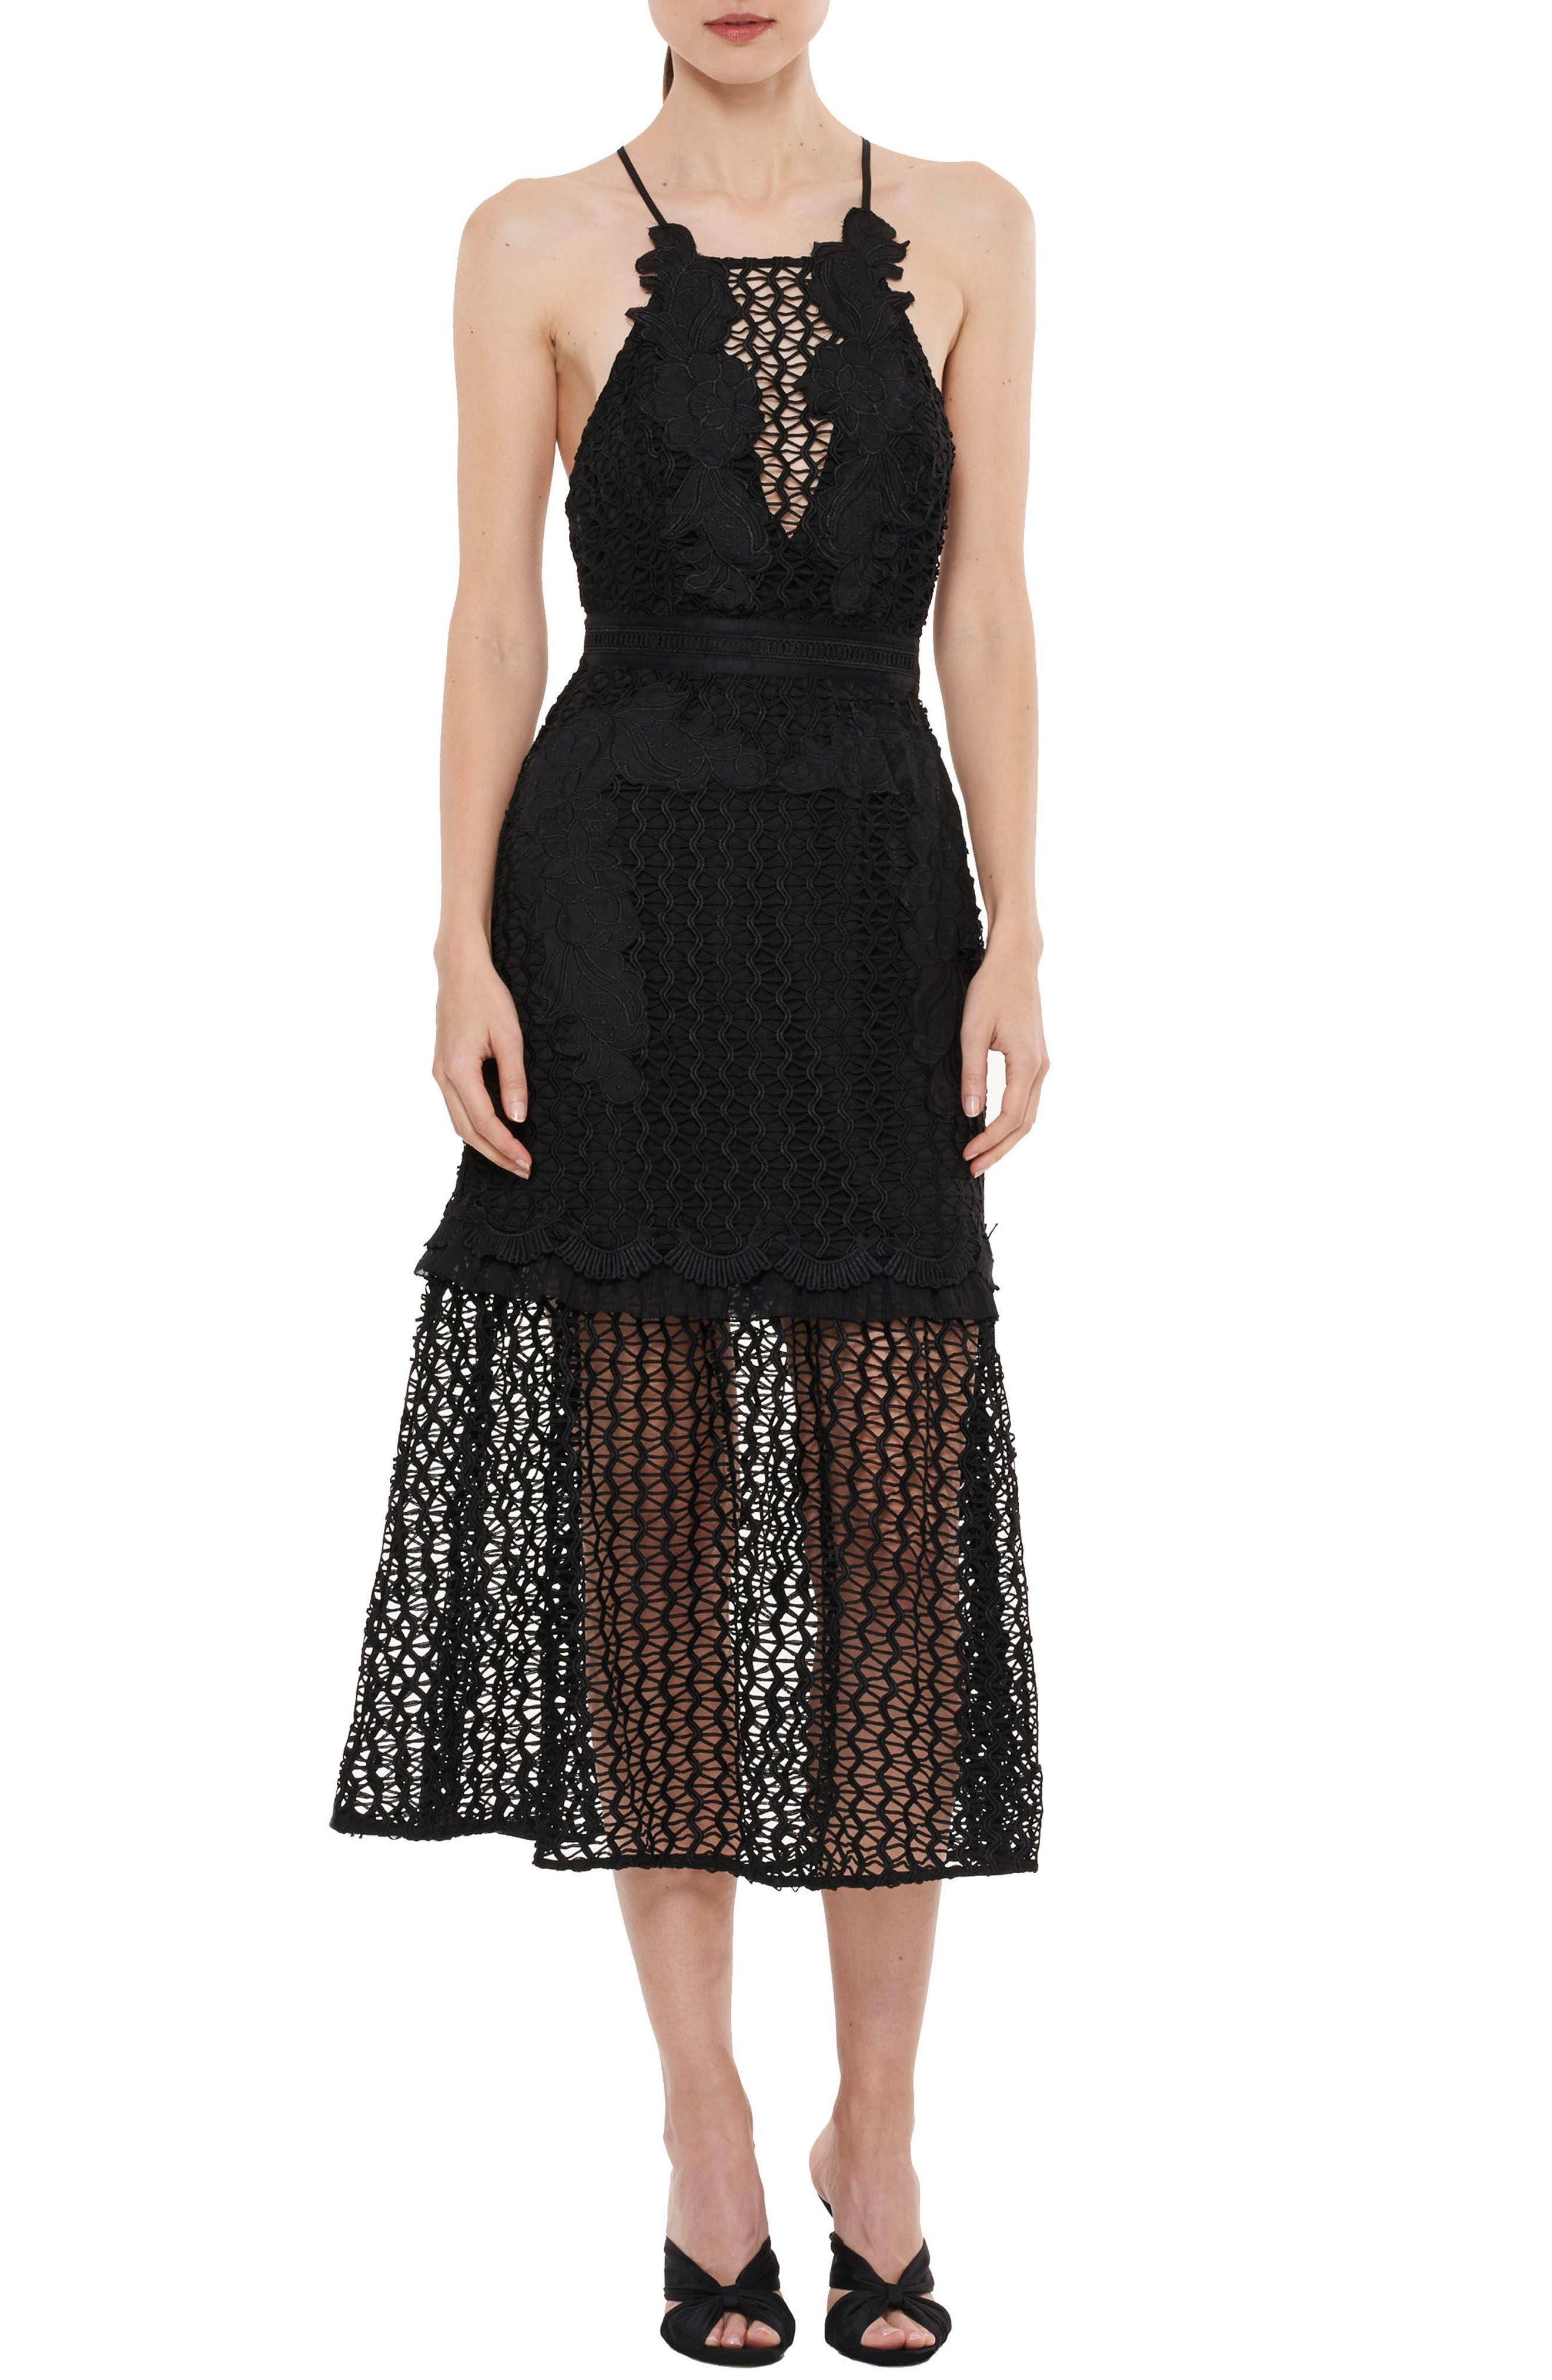 Sweet Dreams Crochet A-Line Dress,                             Main thumbnail 1, color,